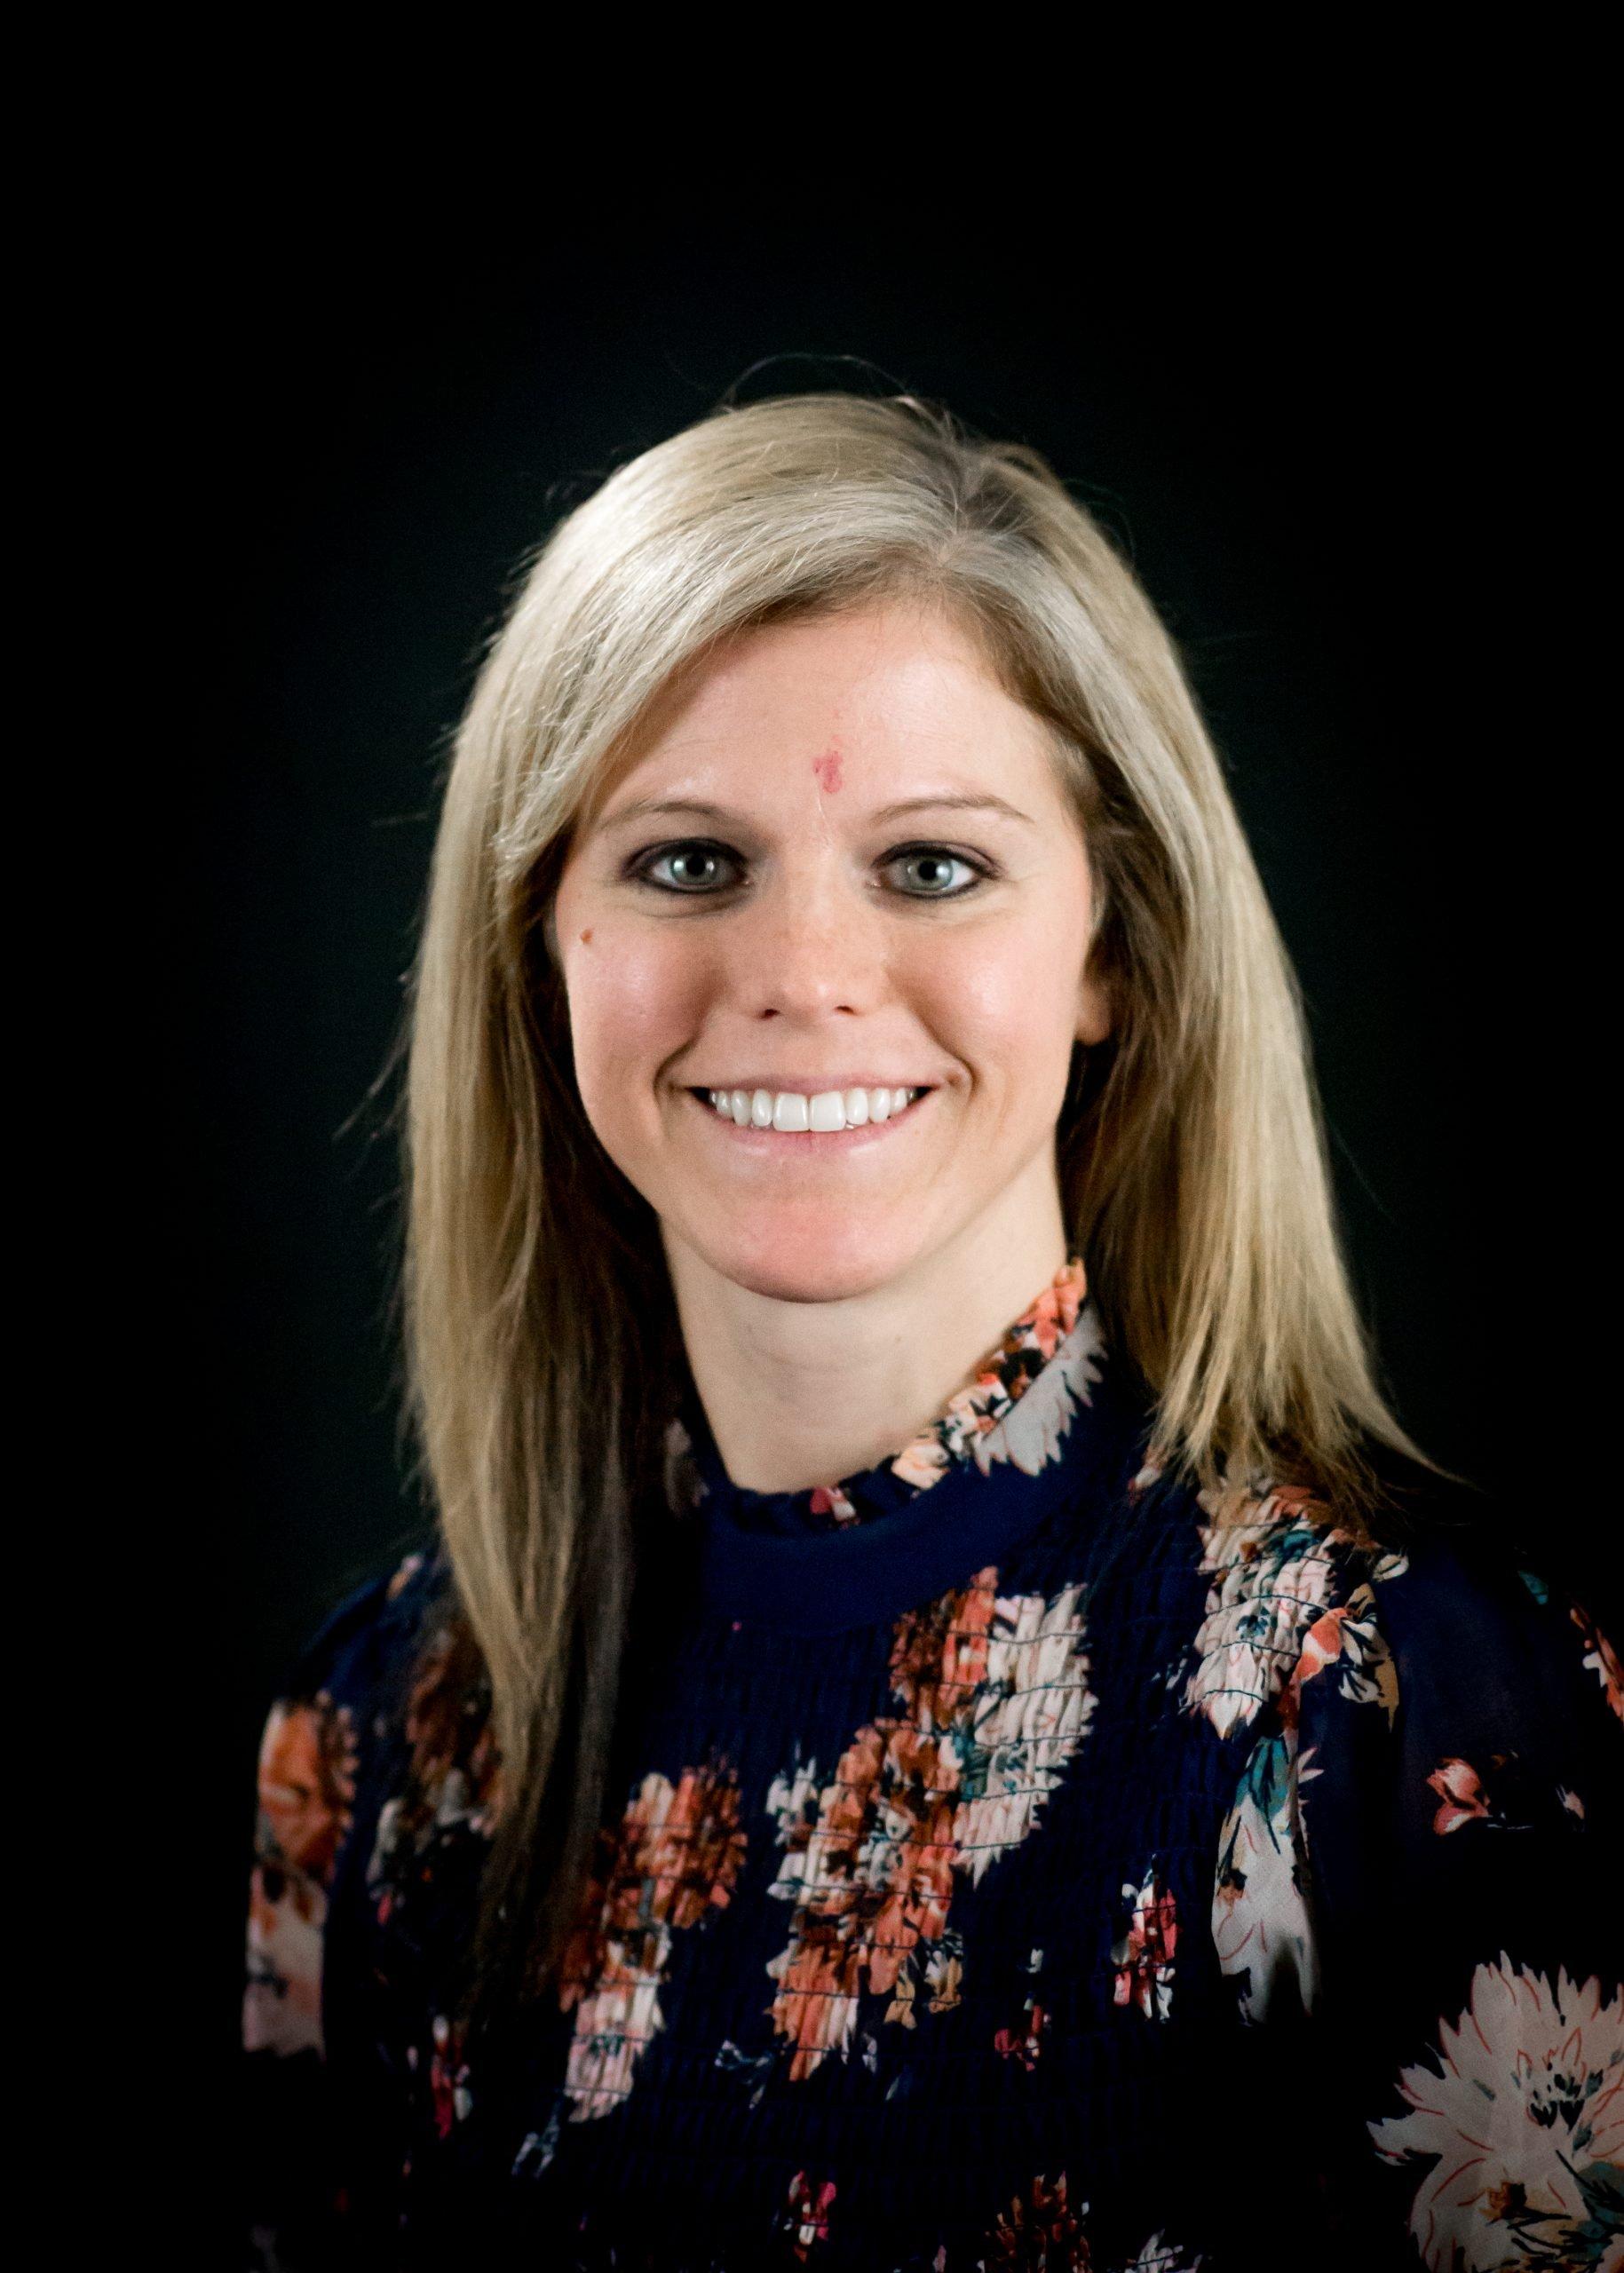 Caitlin Chambers